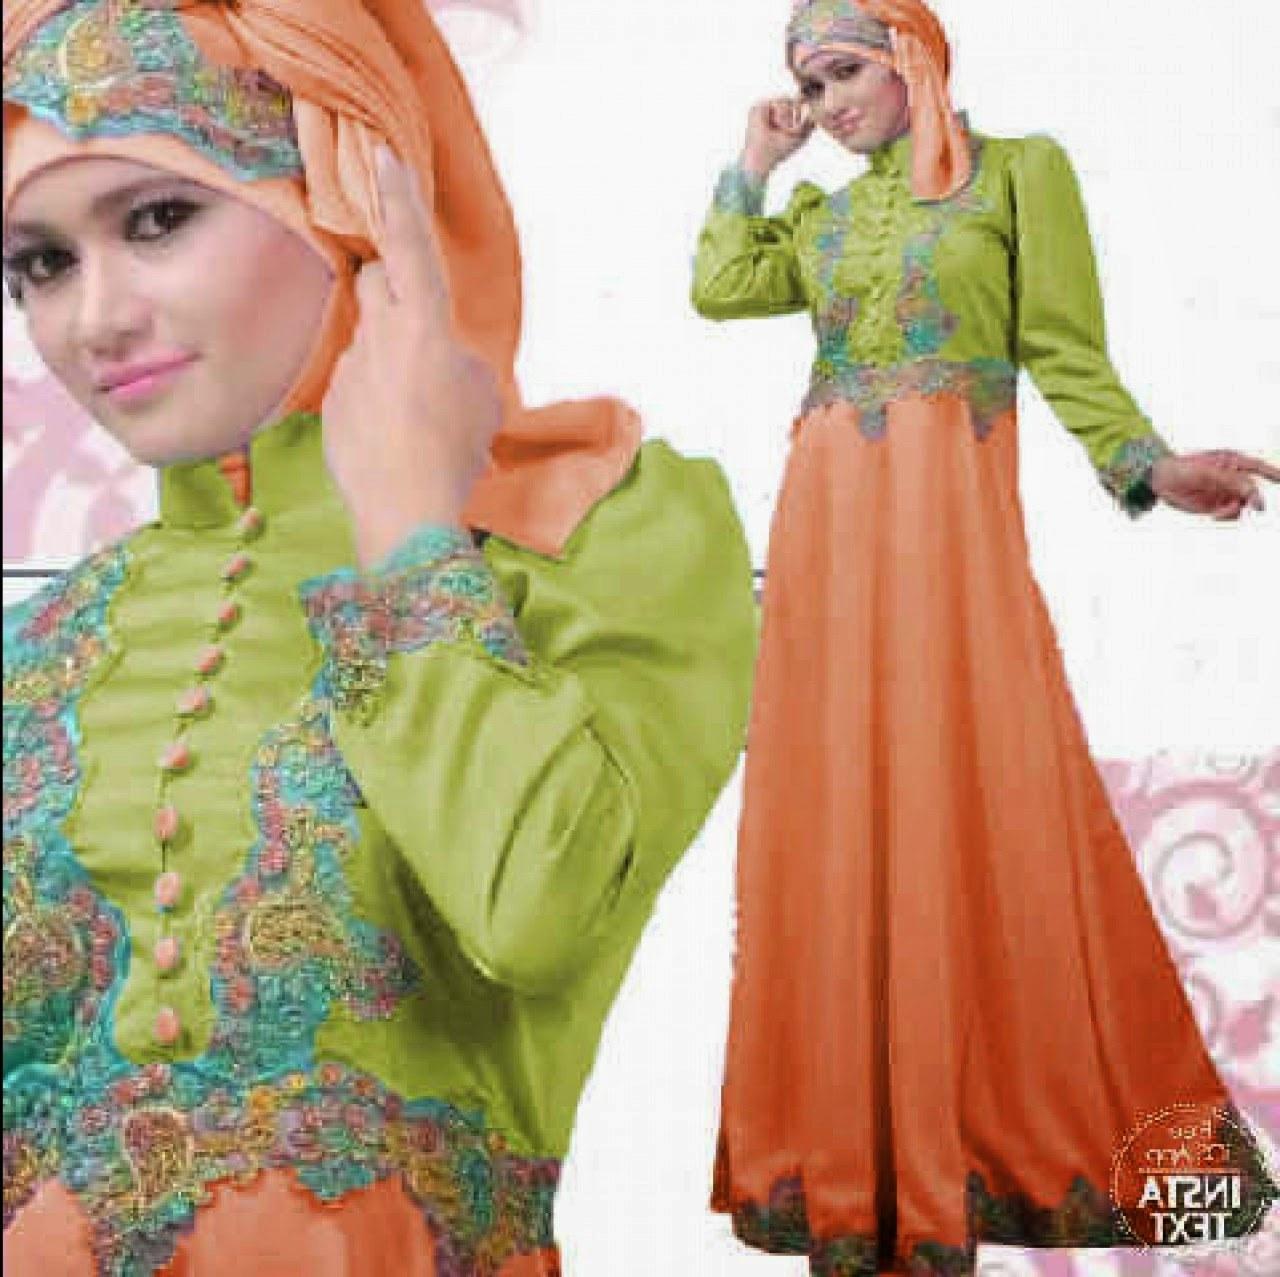 Model Model Baju Lebaran 2018 Wanita Whdr Kumpulan Foto Model Baju Kebaya Lebaran Terbaru 2018